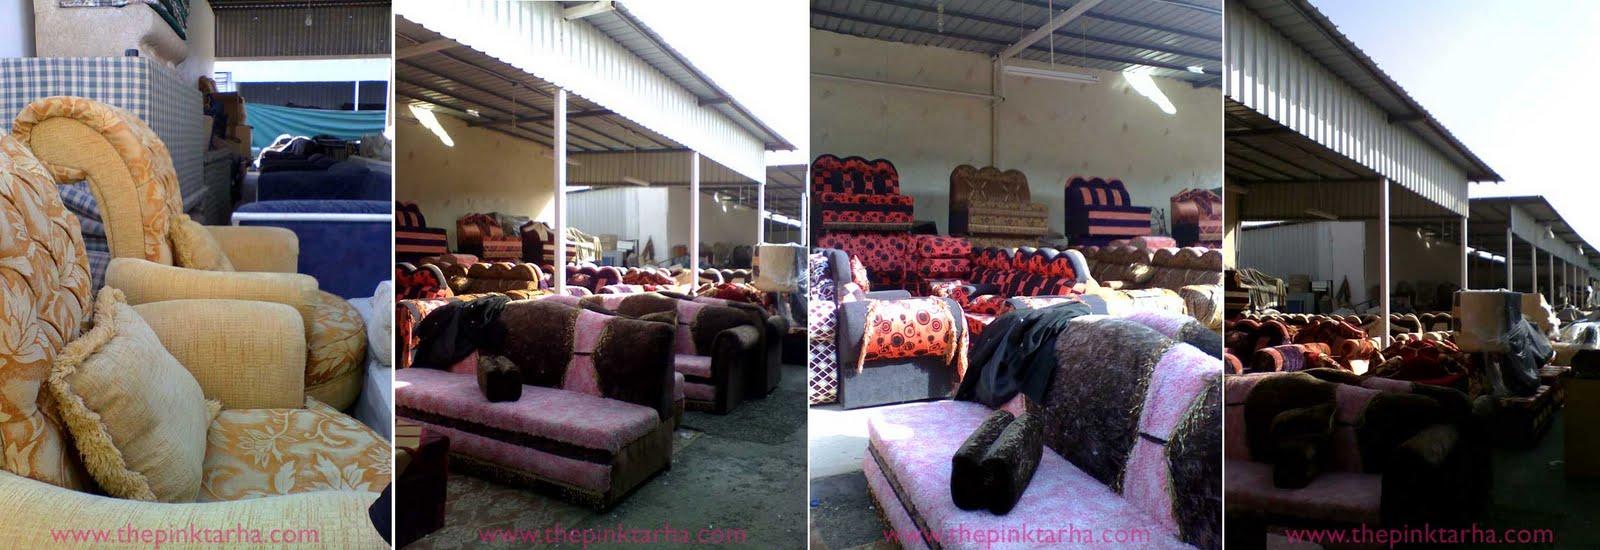 Exposing haraj the pink tarha for Sofa bed jeddah